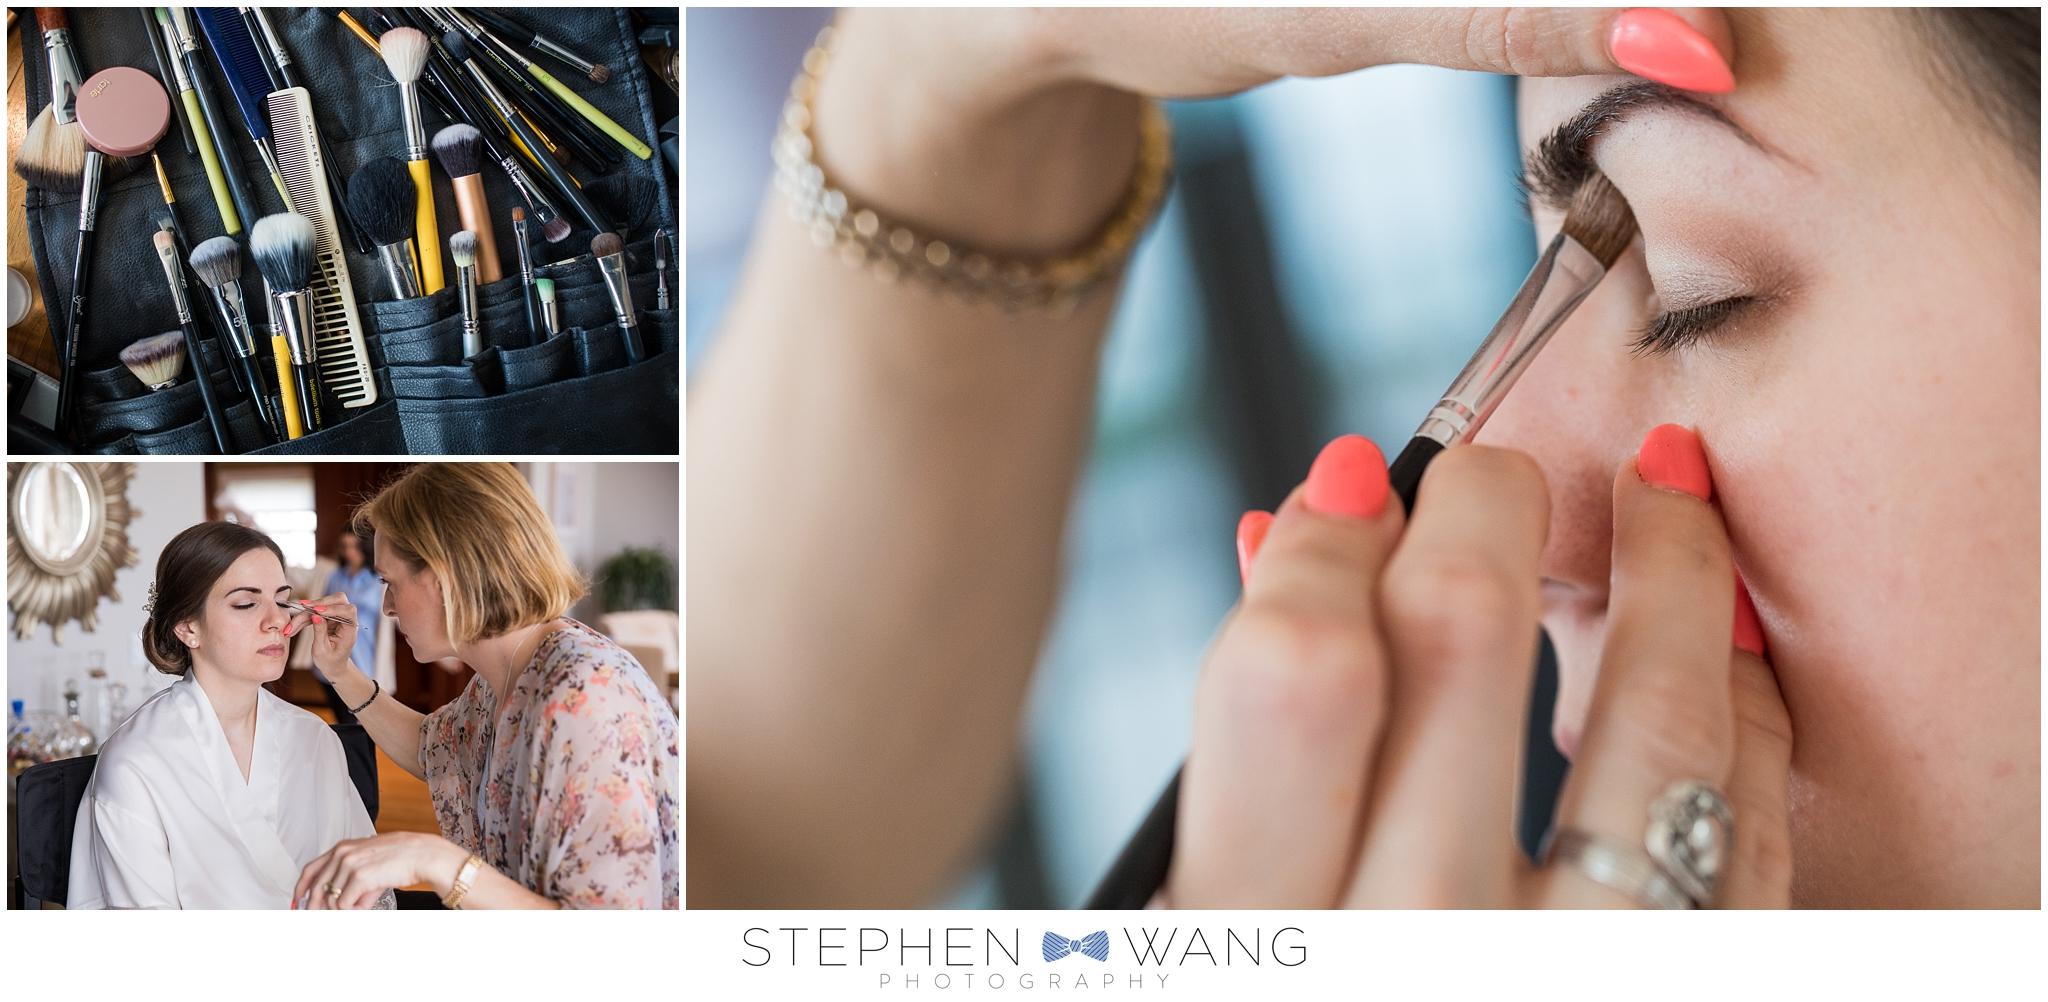 Stephen Wang Photography Shorehaven Norwalk CT Wedding Photographer connecticut shoreline shore haven - 2.jpg